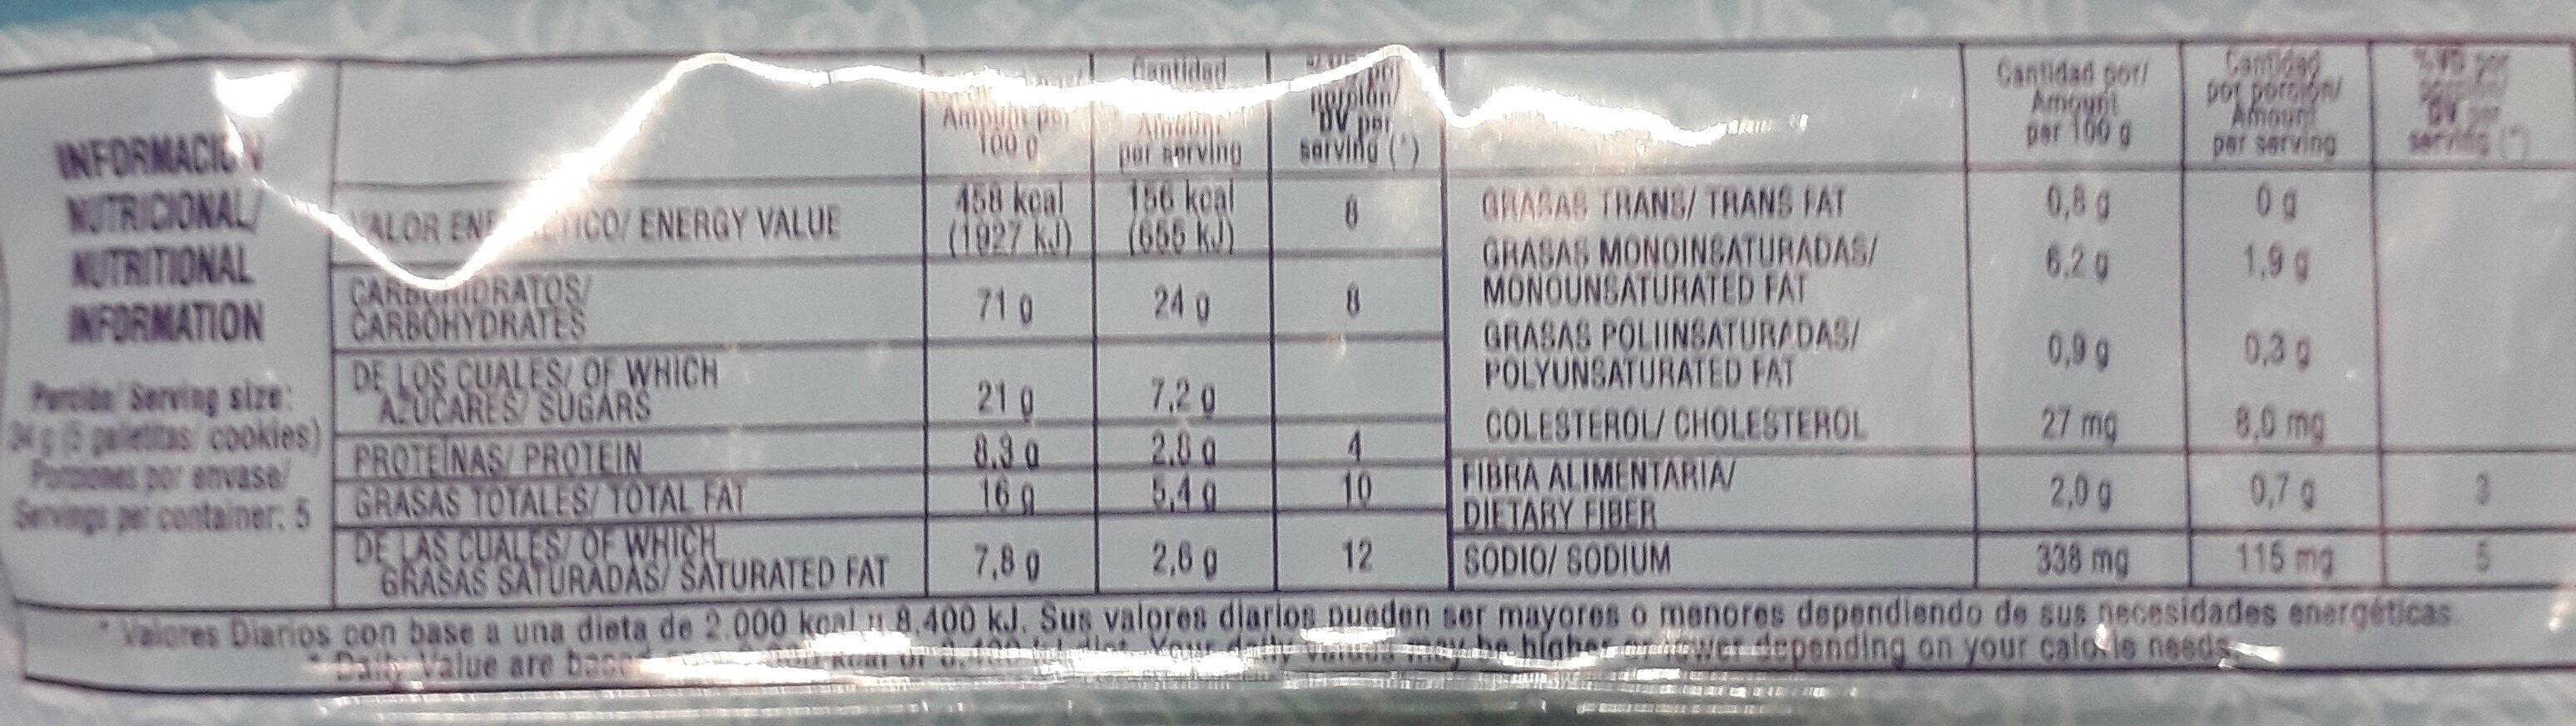 Coquitas - Informations nutritionnelles - es